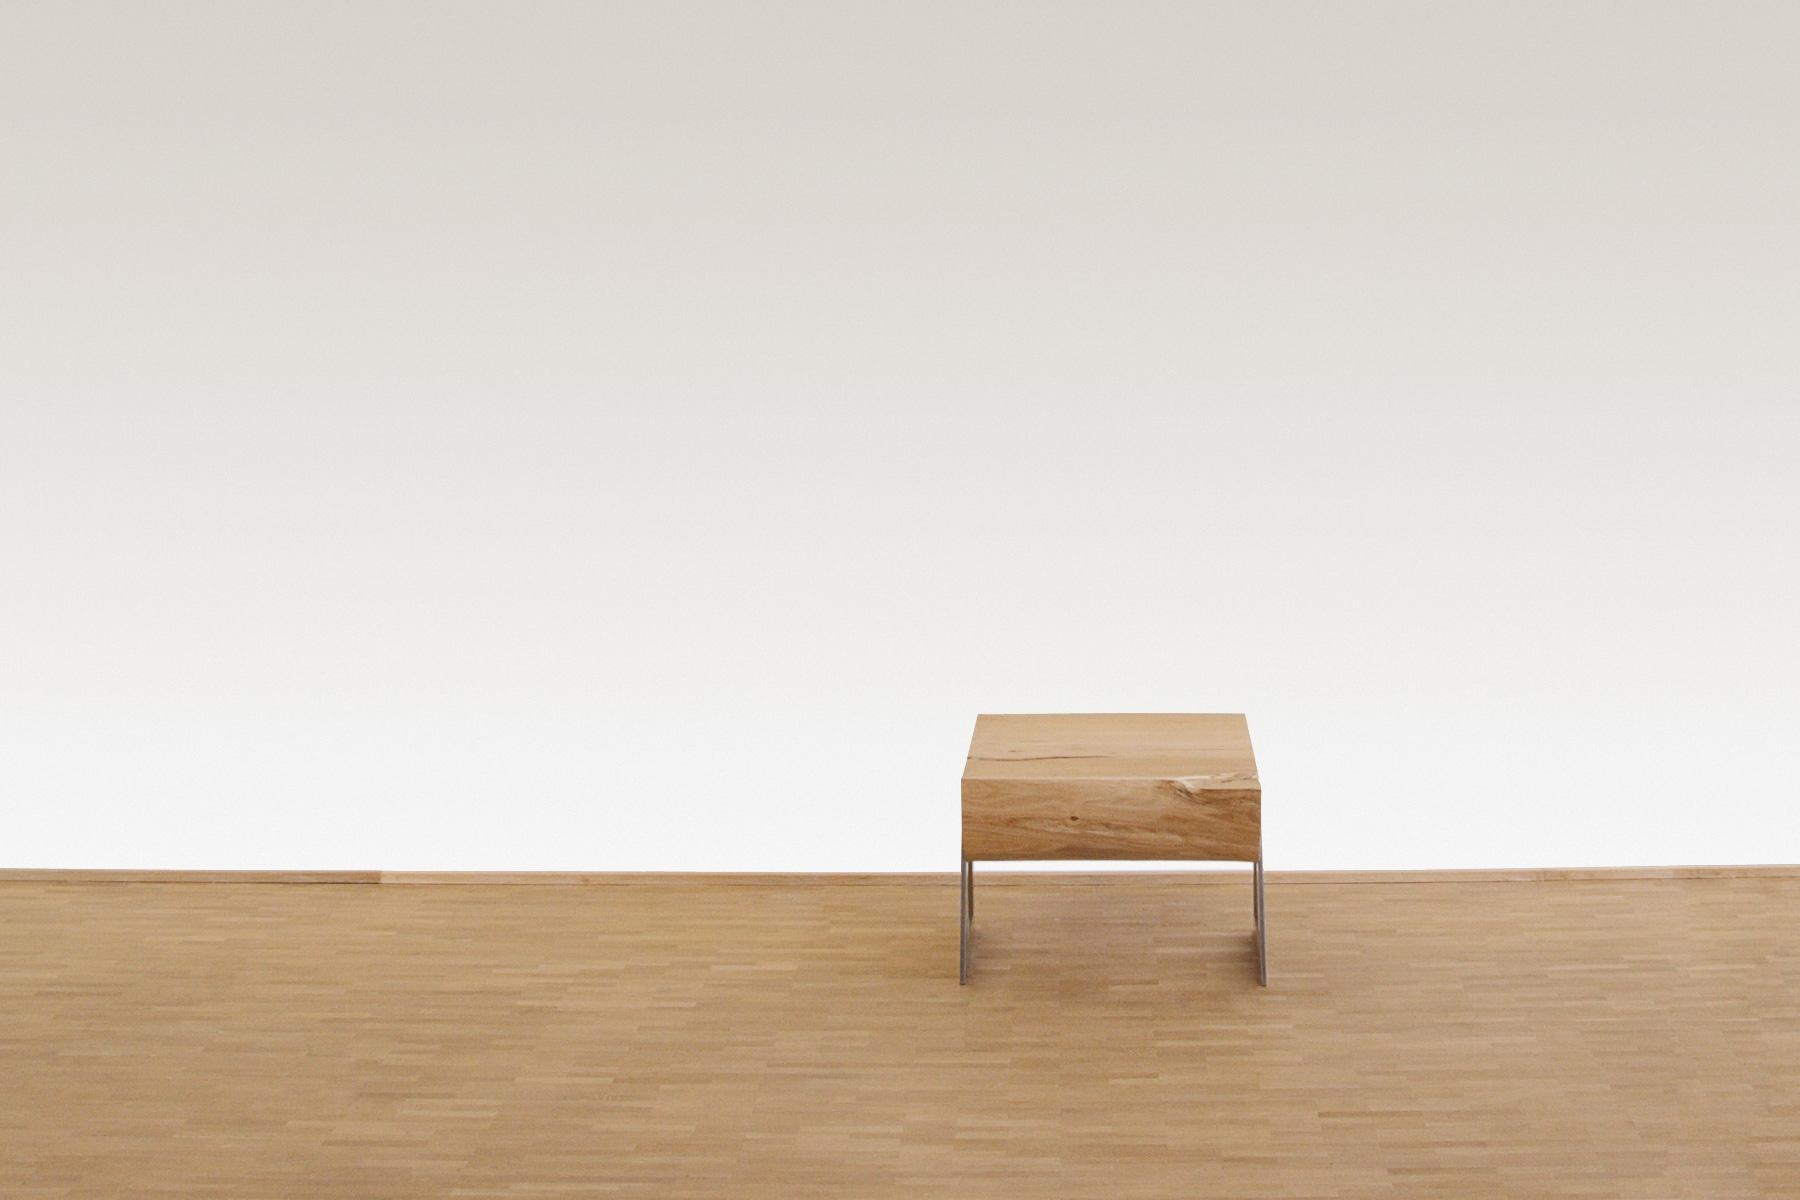 Sitzmöbel SR1